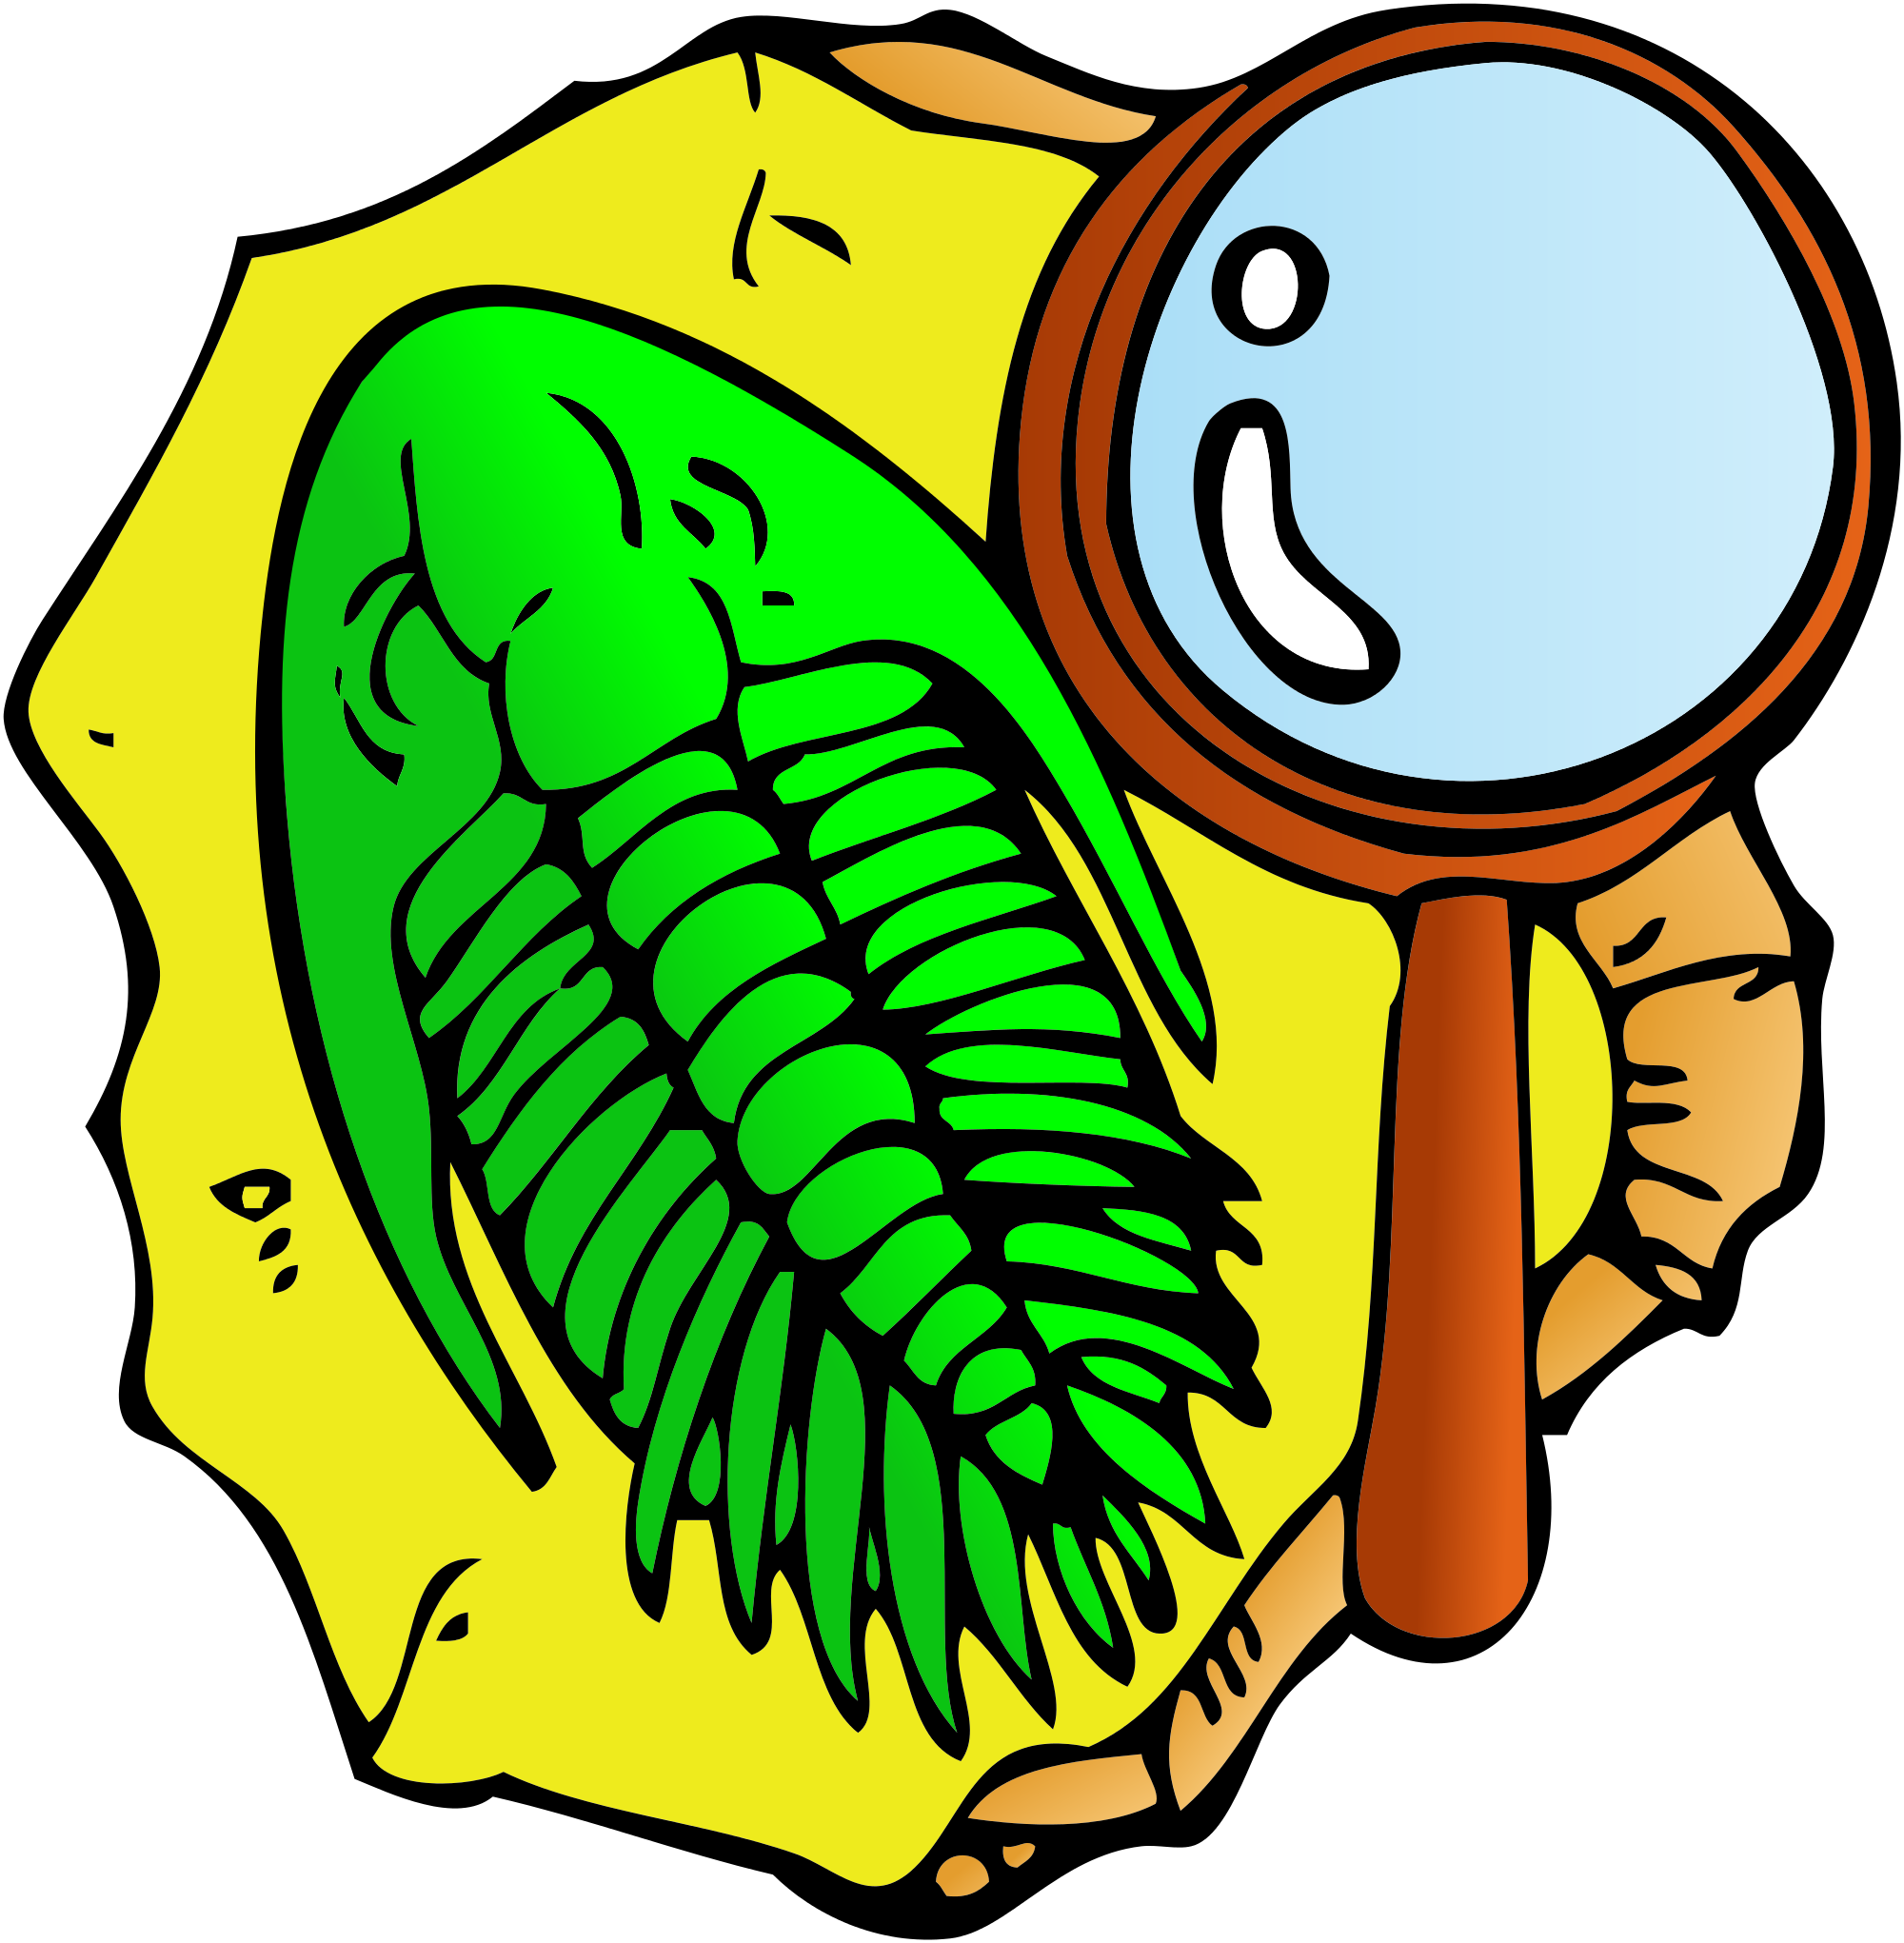 File:Trilobite clipart.